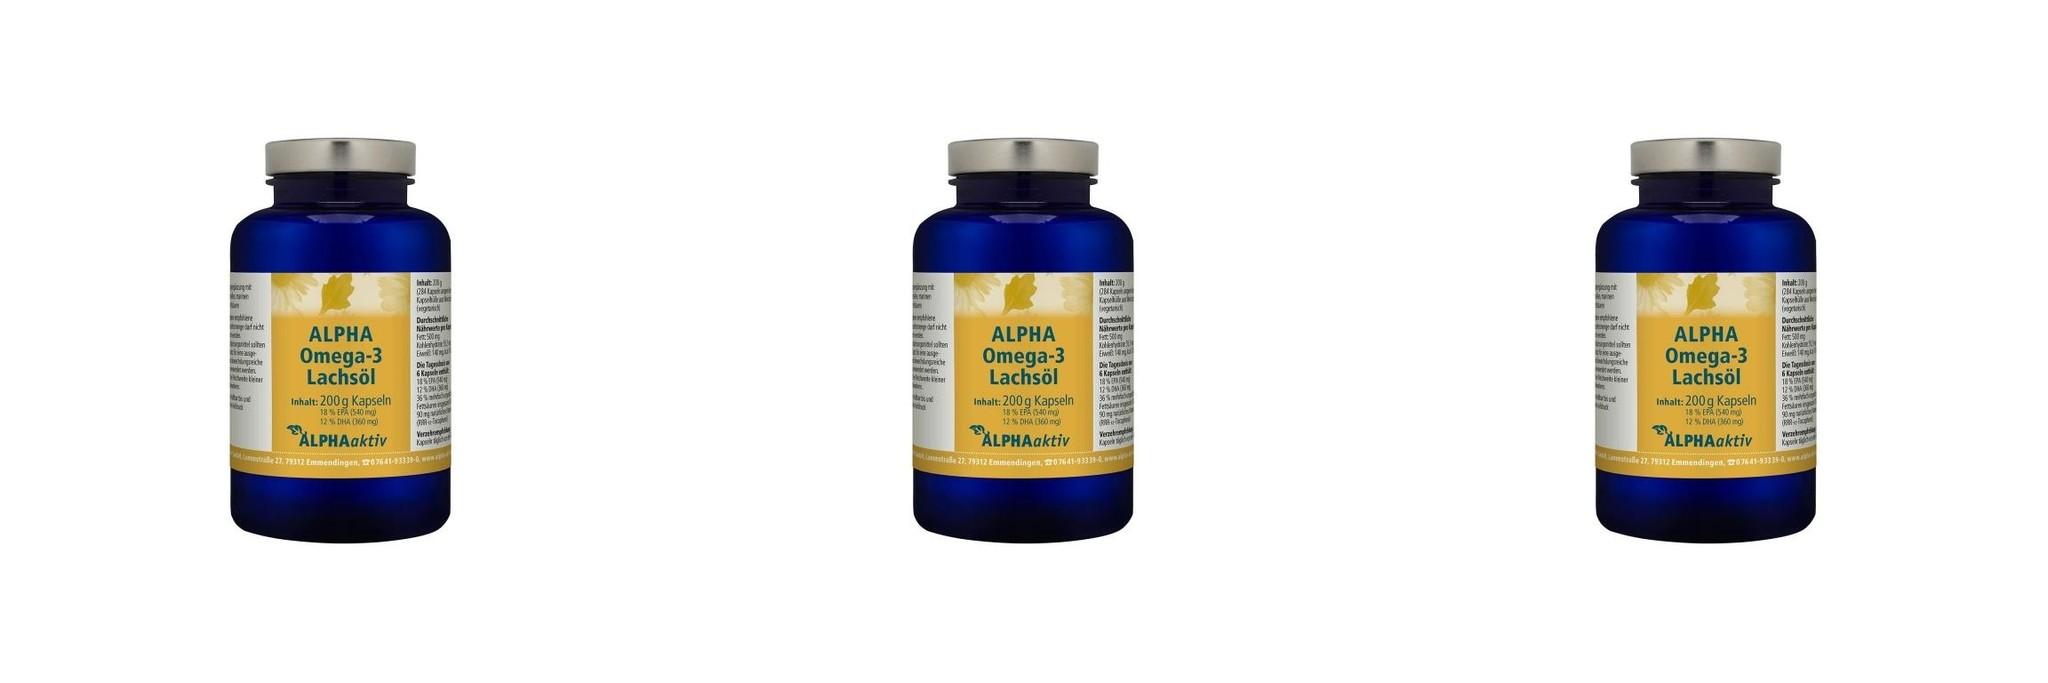 ALPHAaktiv ALPHA Omega-3 Lachsöl, 200 g., 3-packs